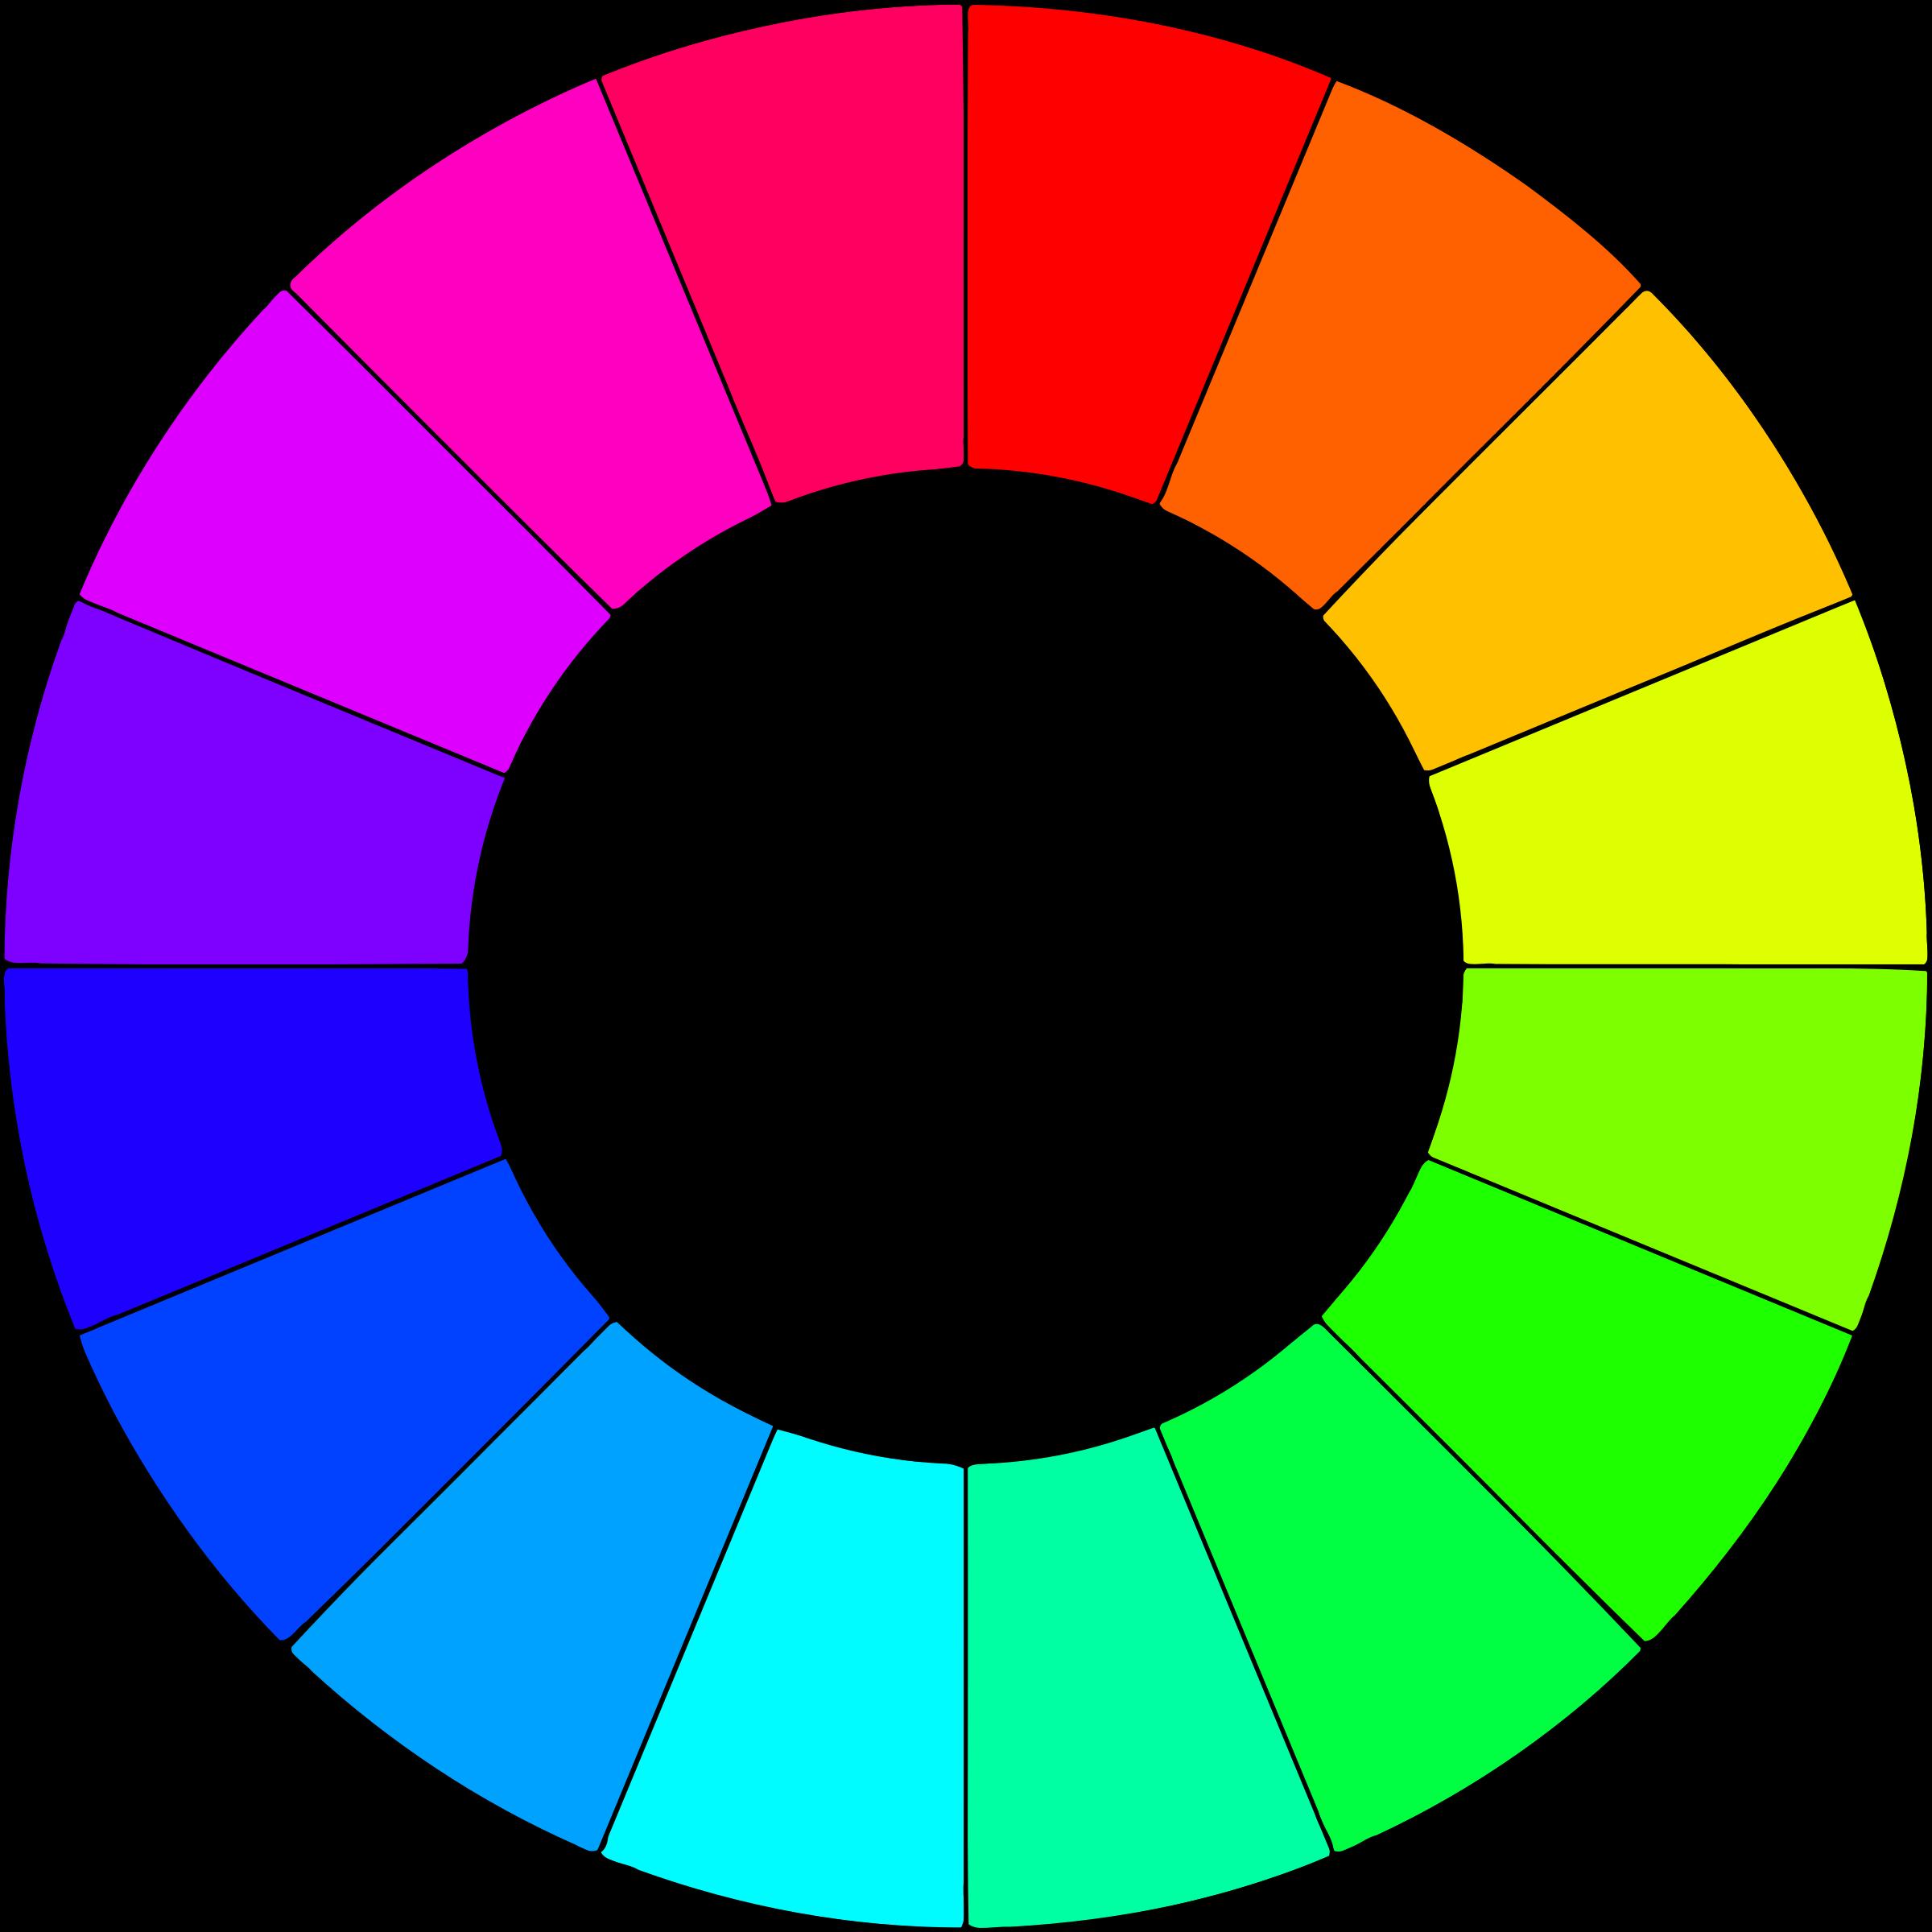 Circle clipart colored. Color wheel colors big